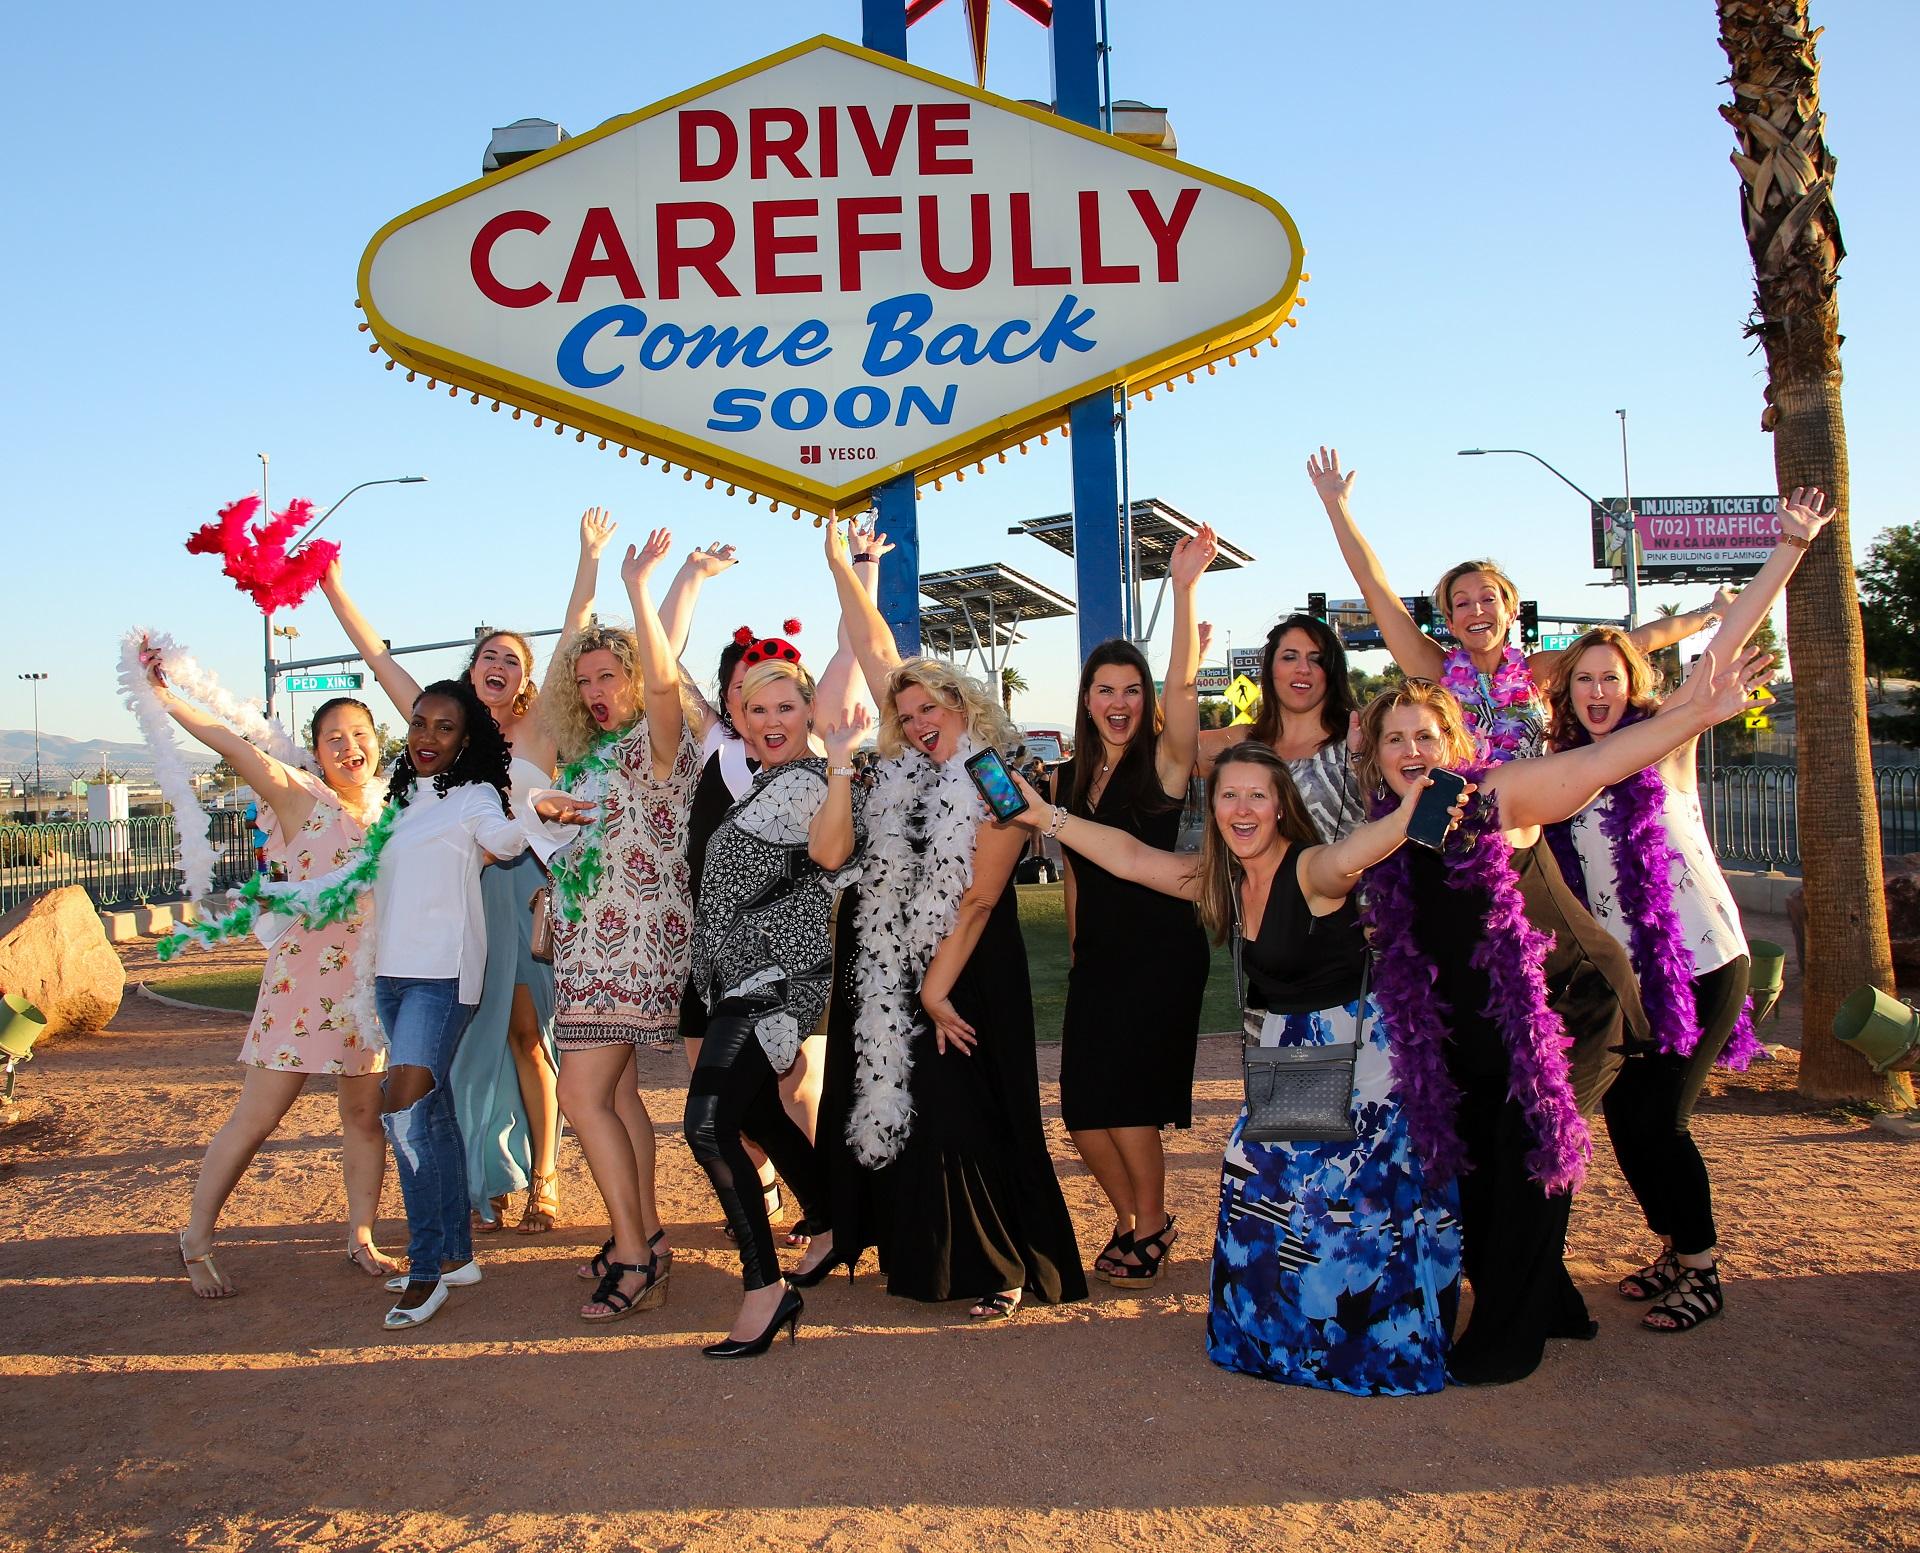 2017 Canadian Wedding Planners Las Vegas Wedding Familiarization Trip